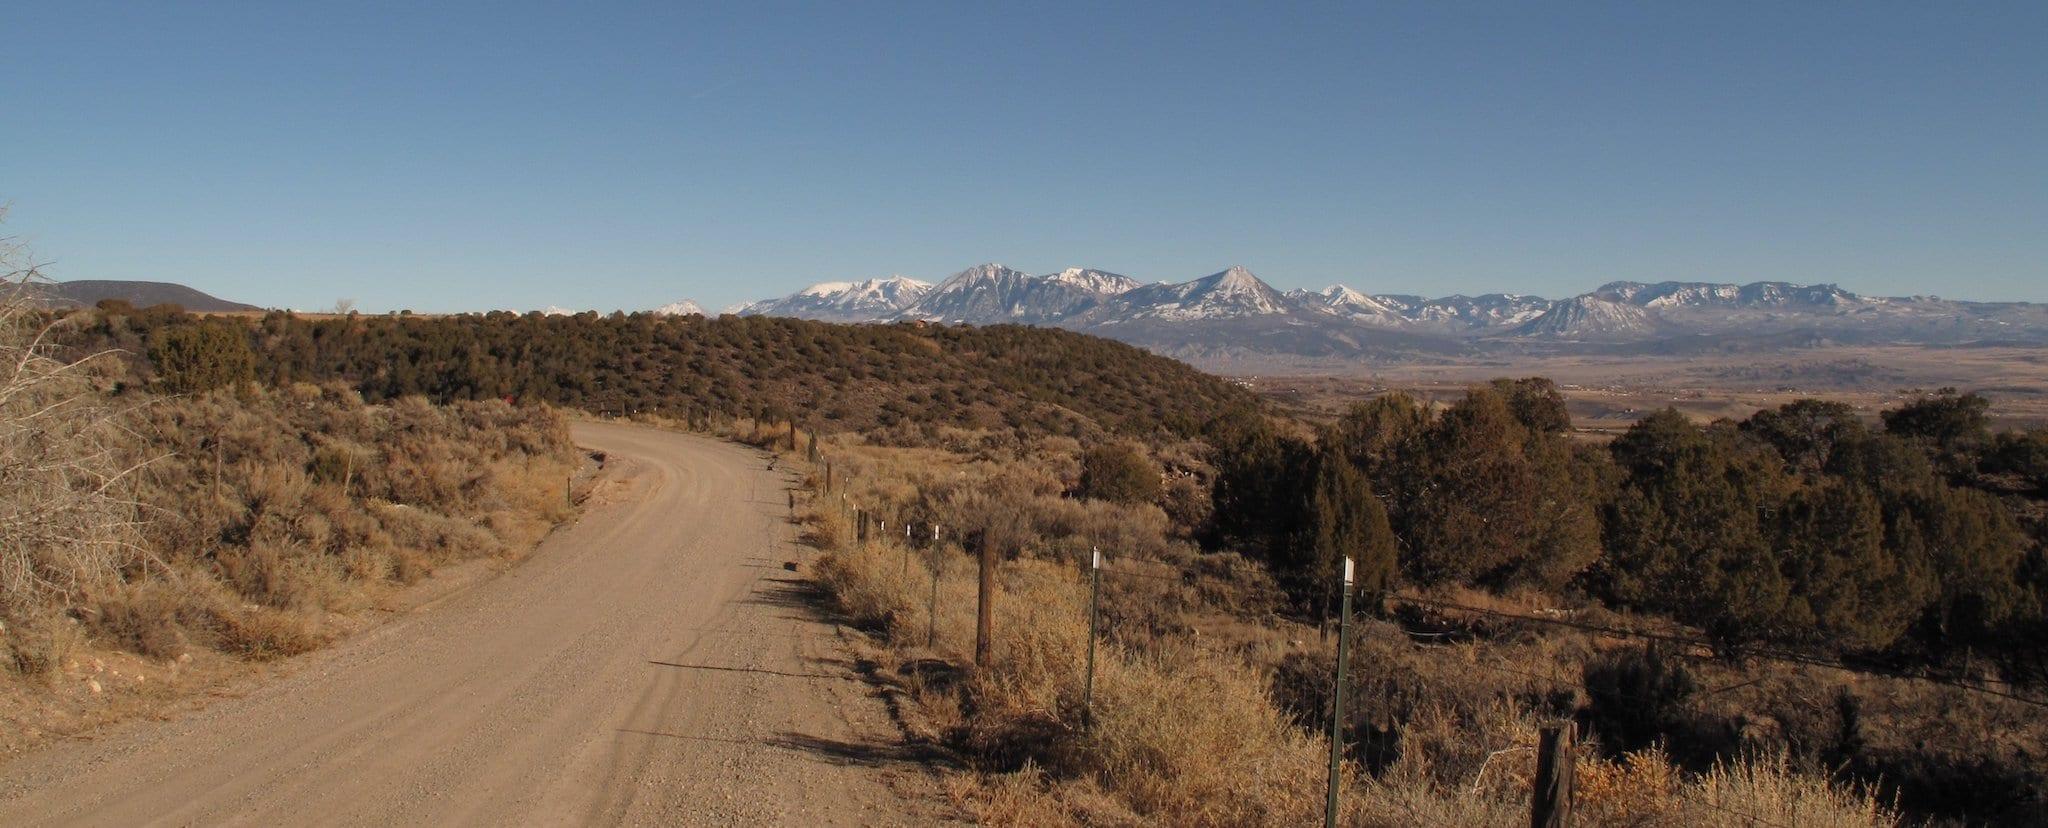 West Elk Mountains from Redlands Mesa, near Hotchkiss